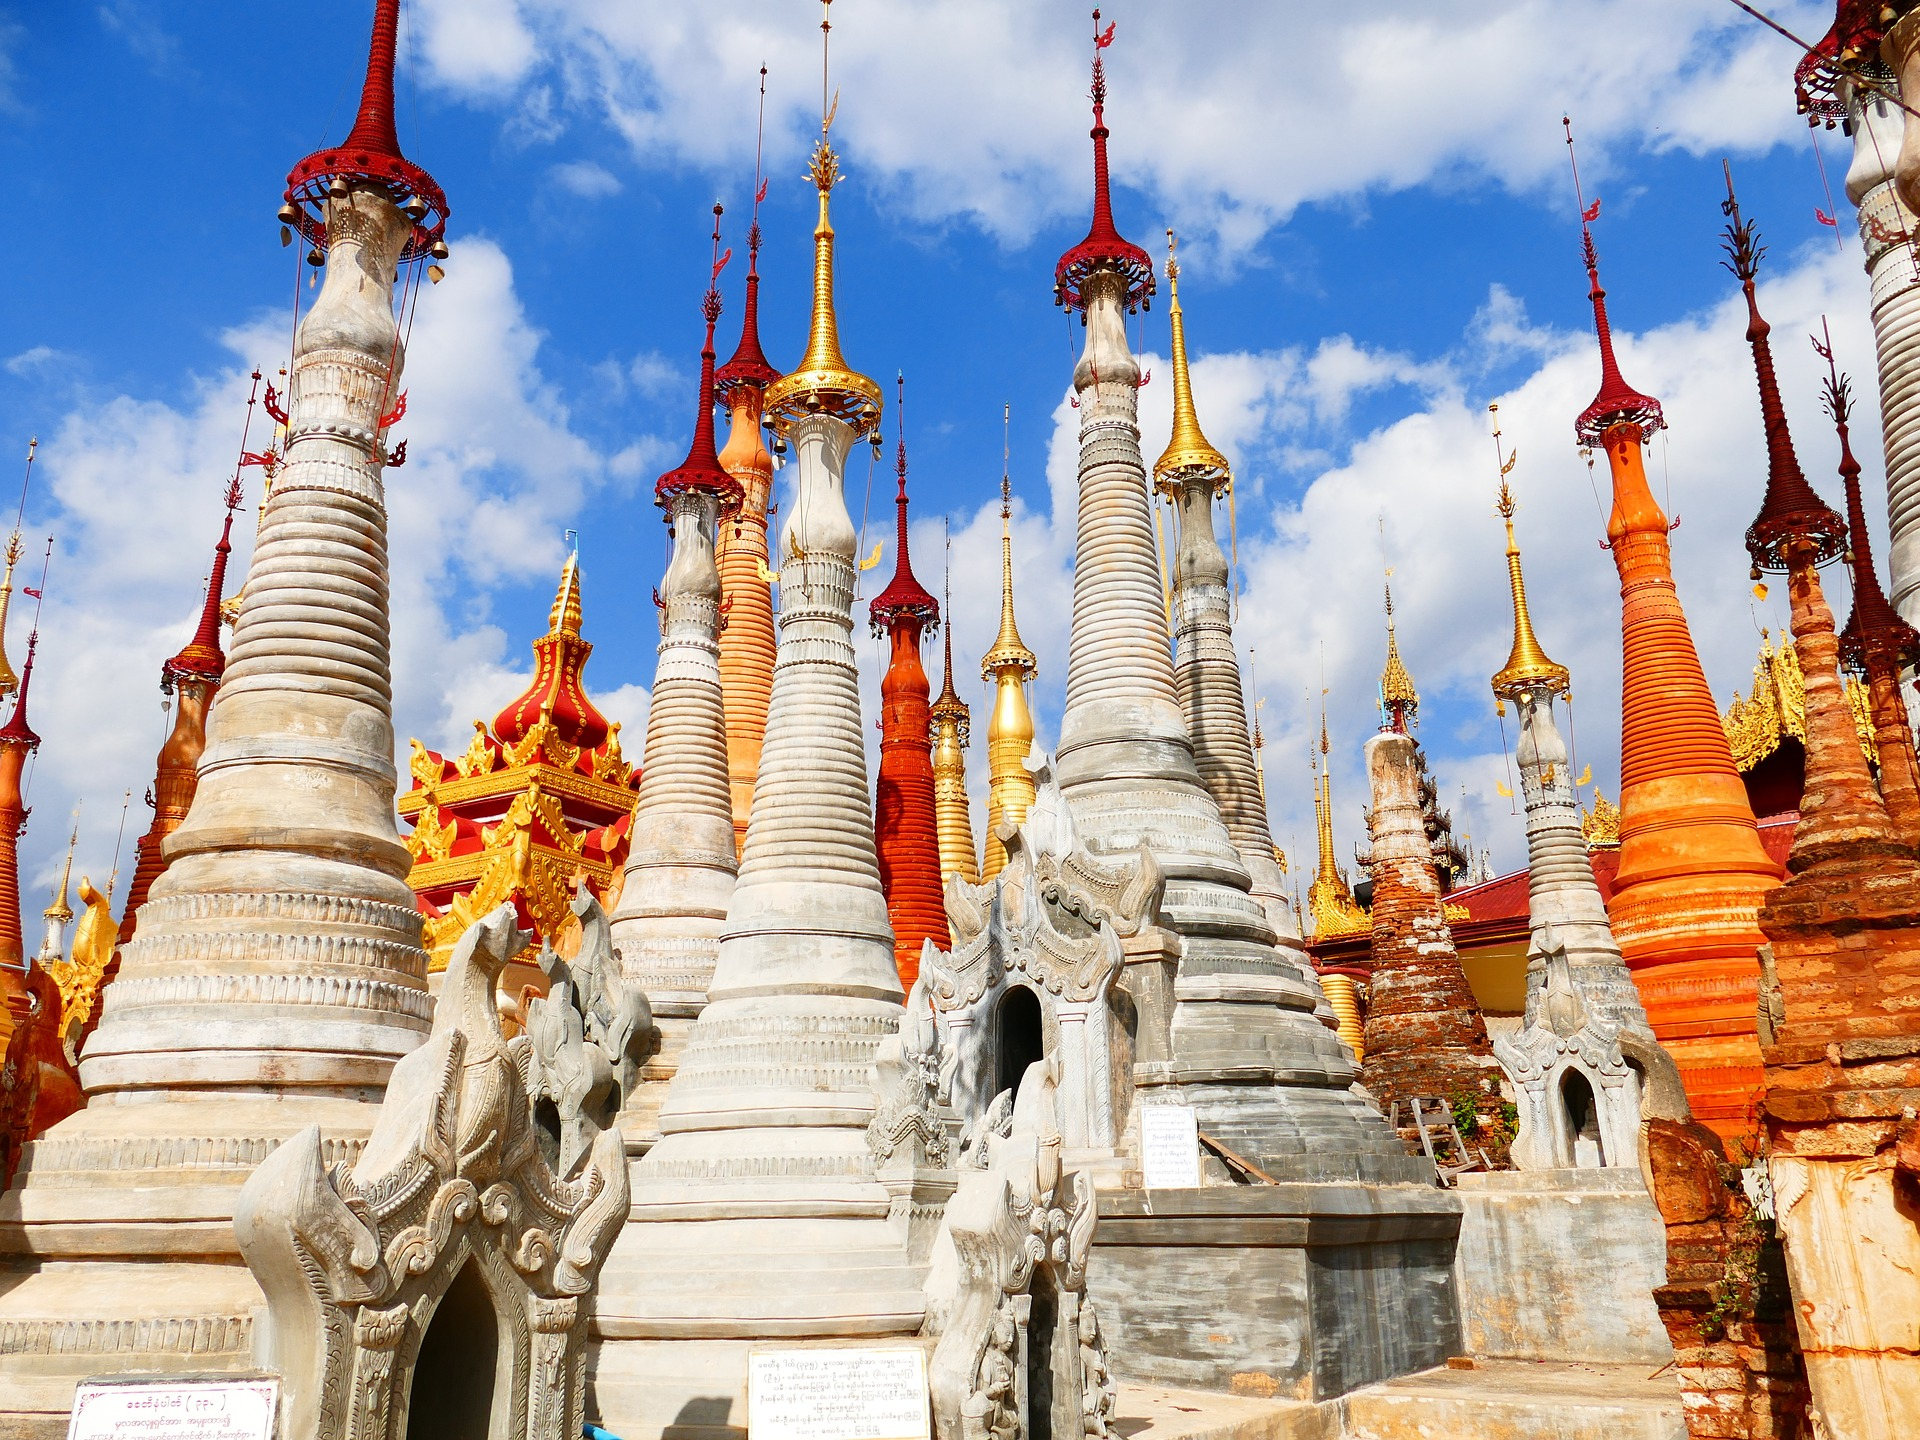 Templo de, Myanmar, Birmânia, pagode, stupa - Papéis de parede HD - Professor-falken.com